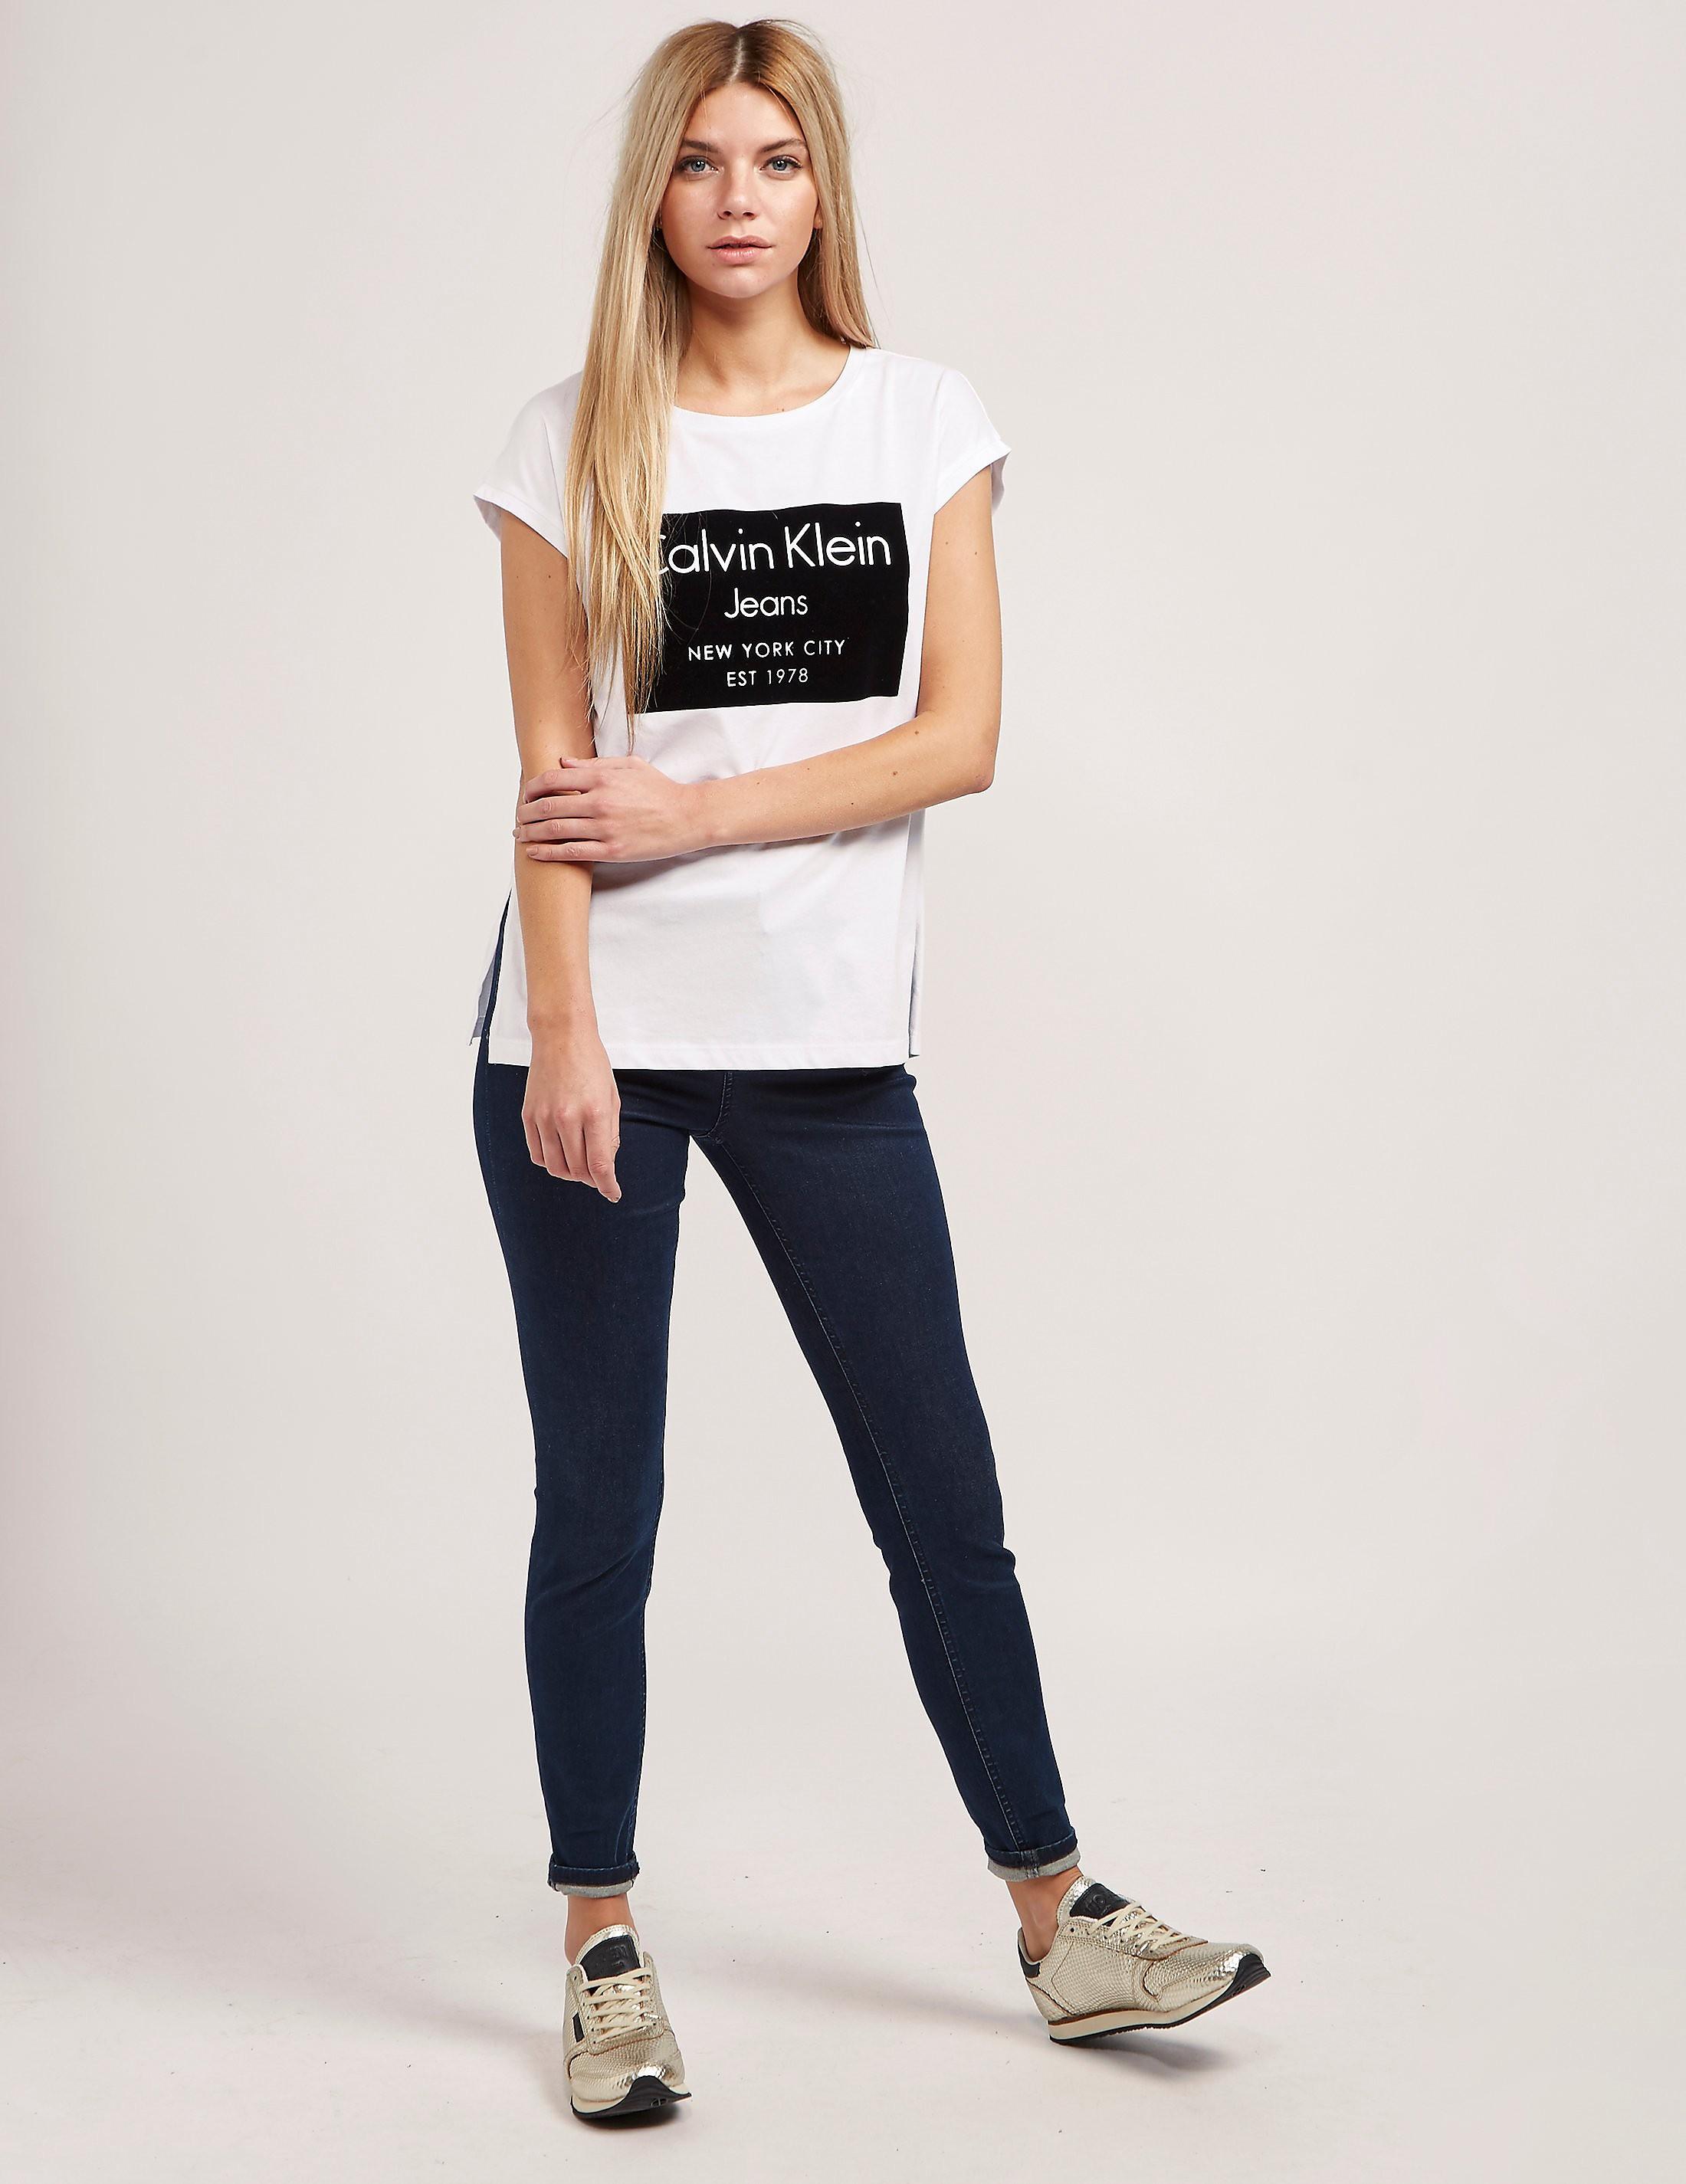 Calvin Klein Tika 22 Short Sleeve T-Shirt